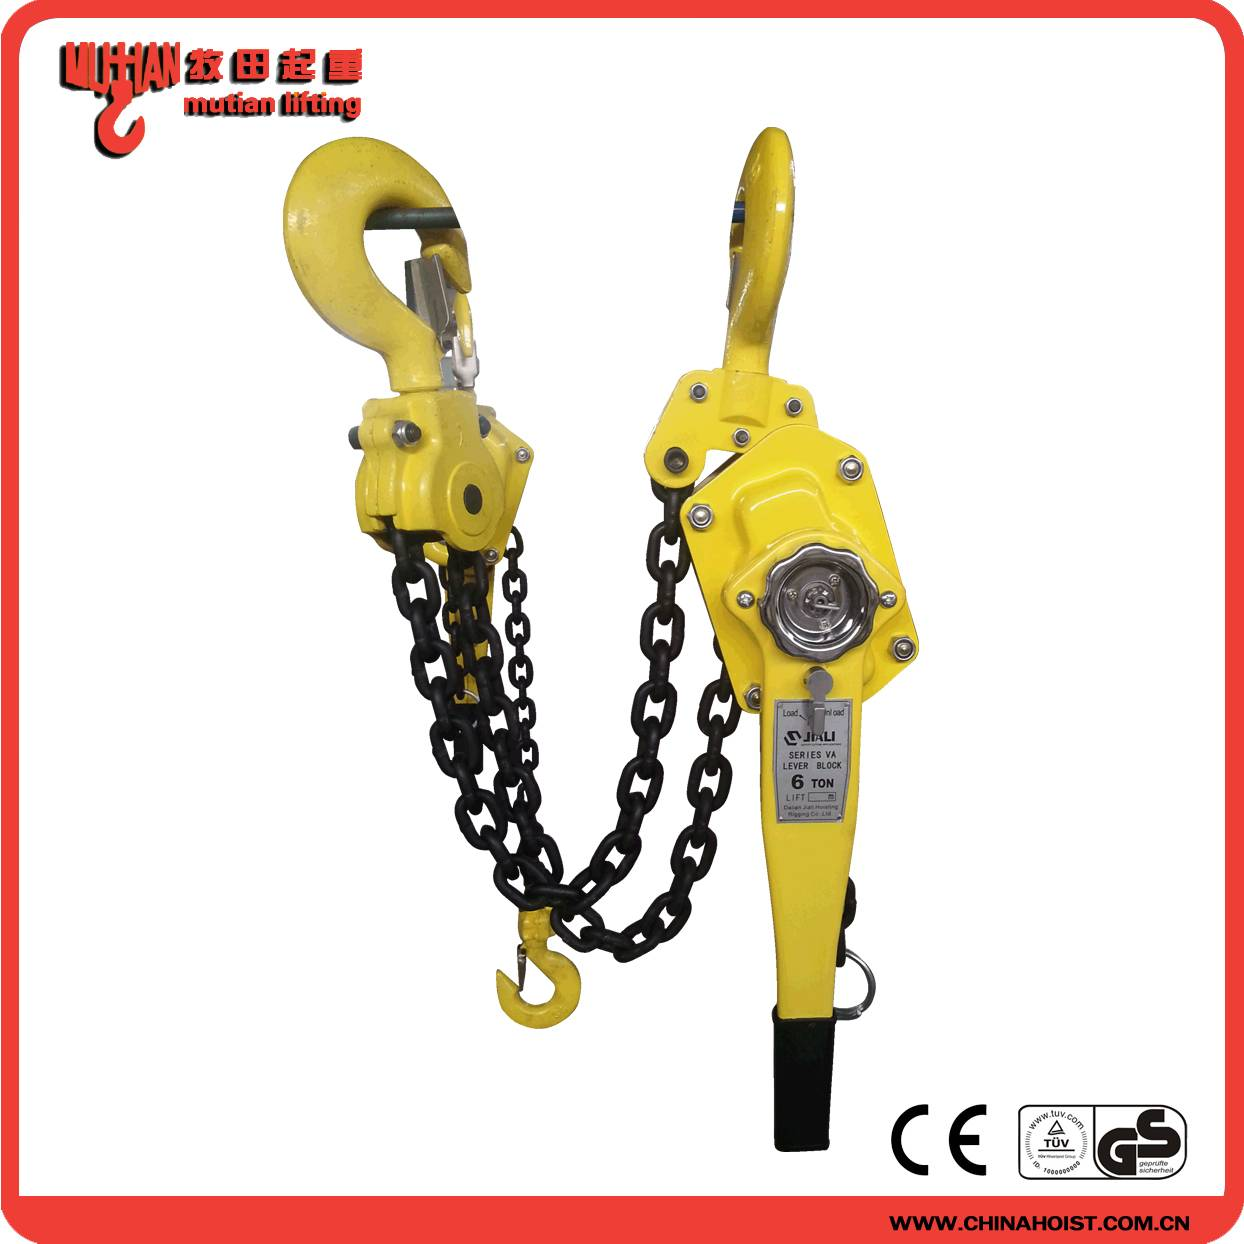 HSH-VL 0.8T mini high quality pulley lever hoist